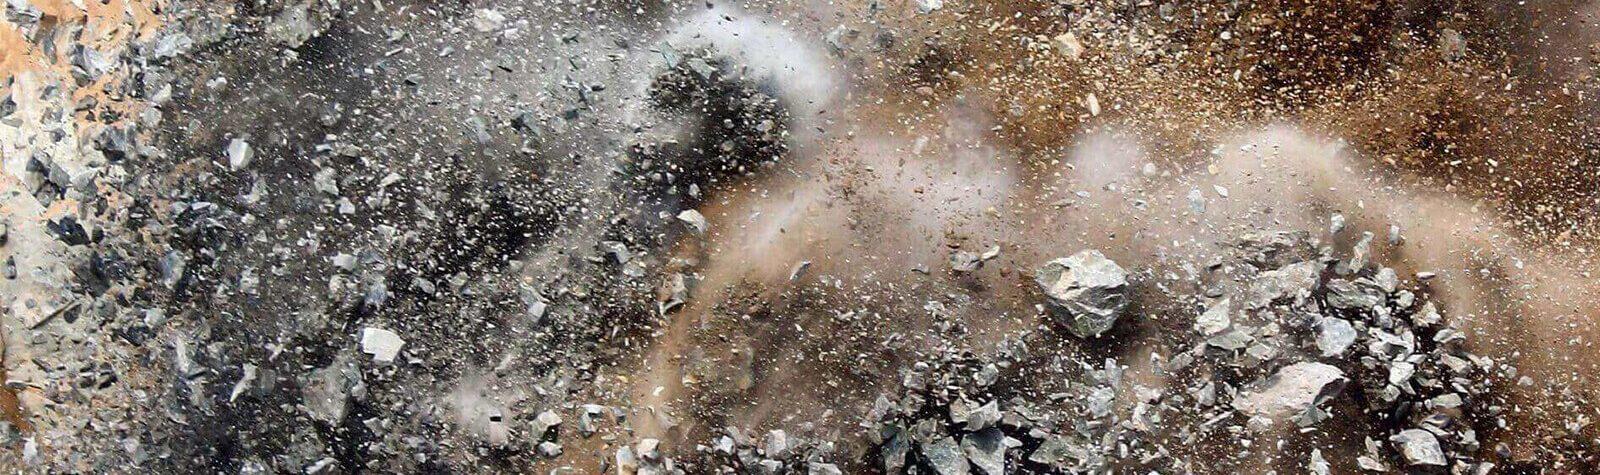 commercial blast, commercial explosives, infrastructure explosives, mining explosives in Kenya